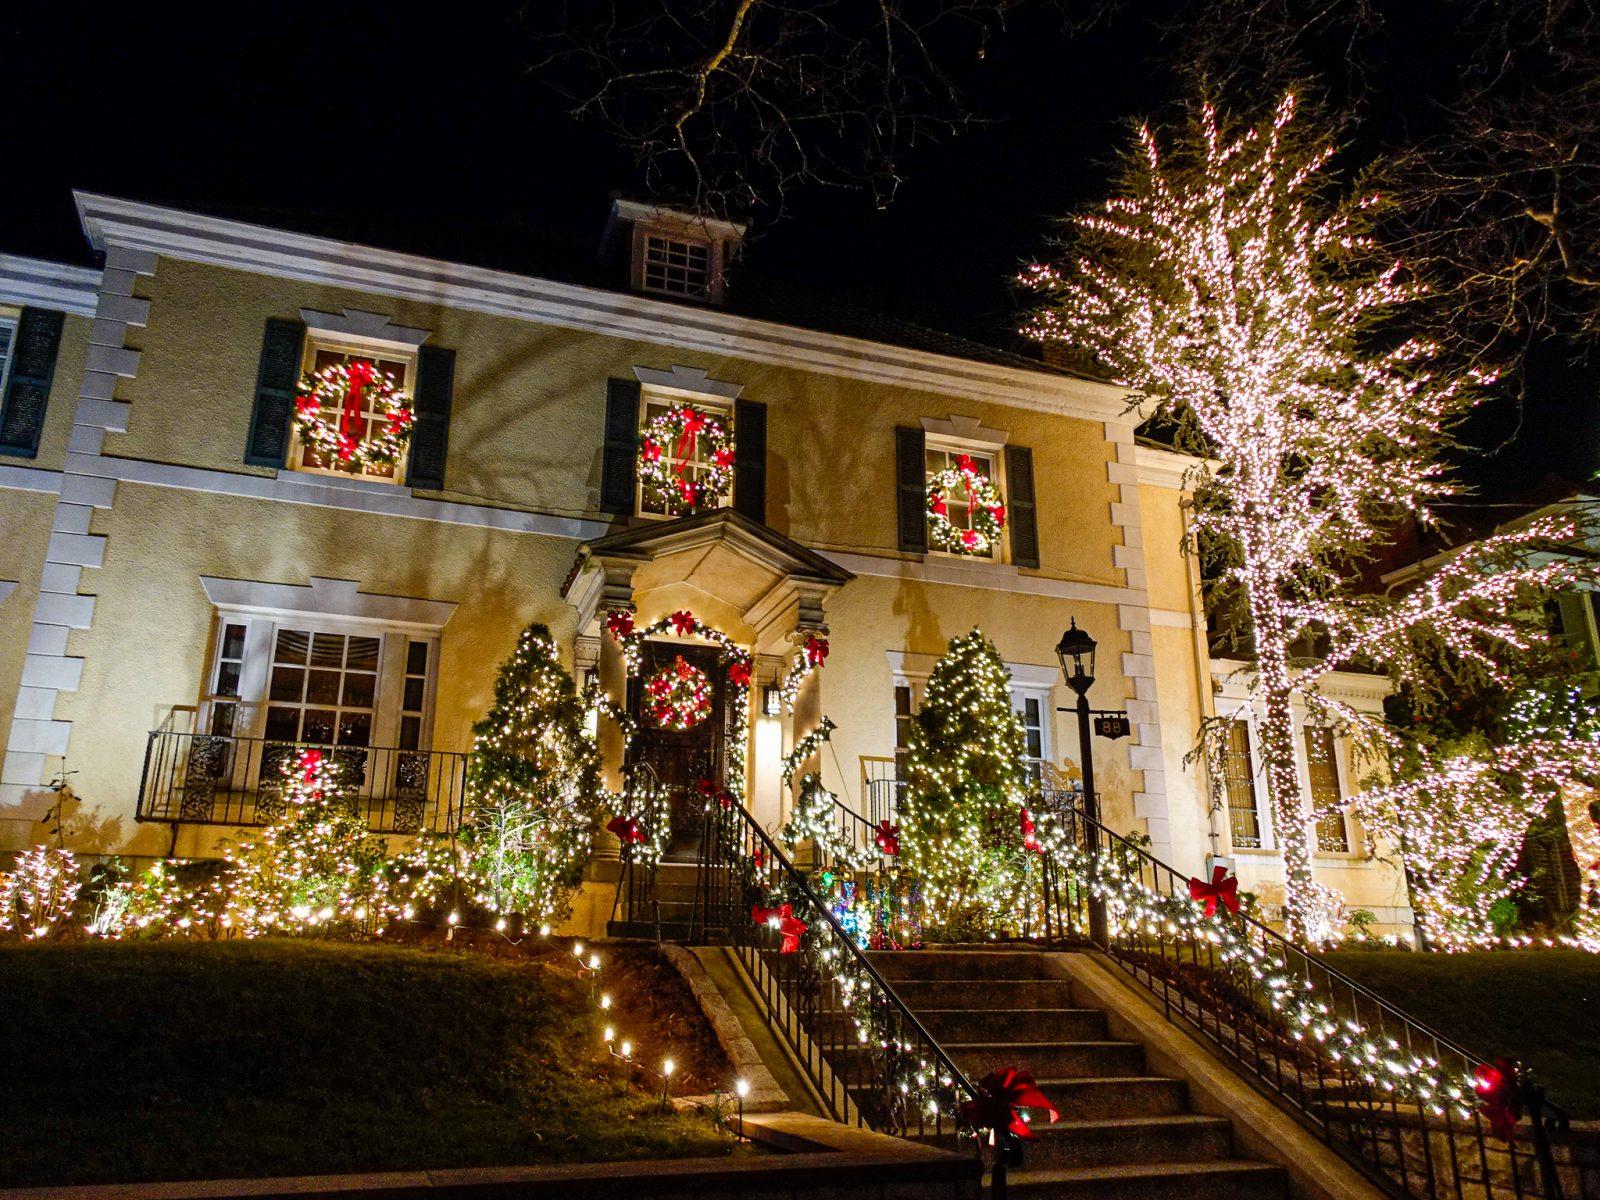 amerikansk julepyntet hus